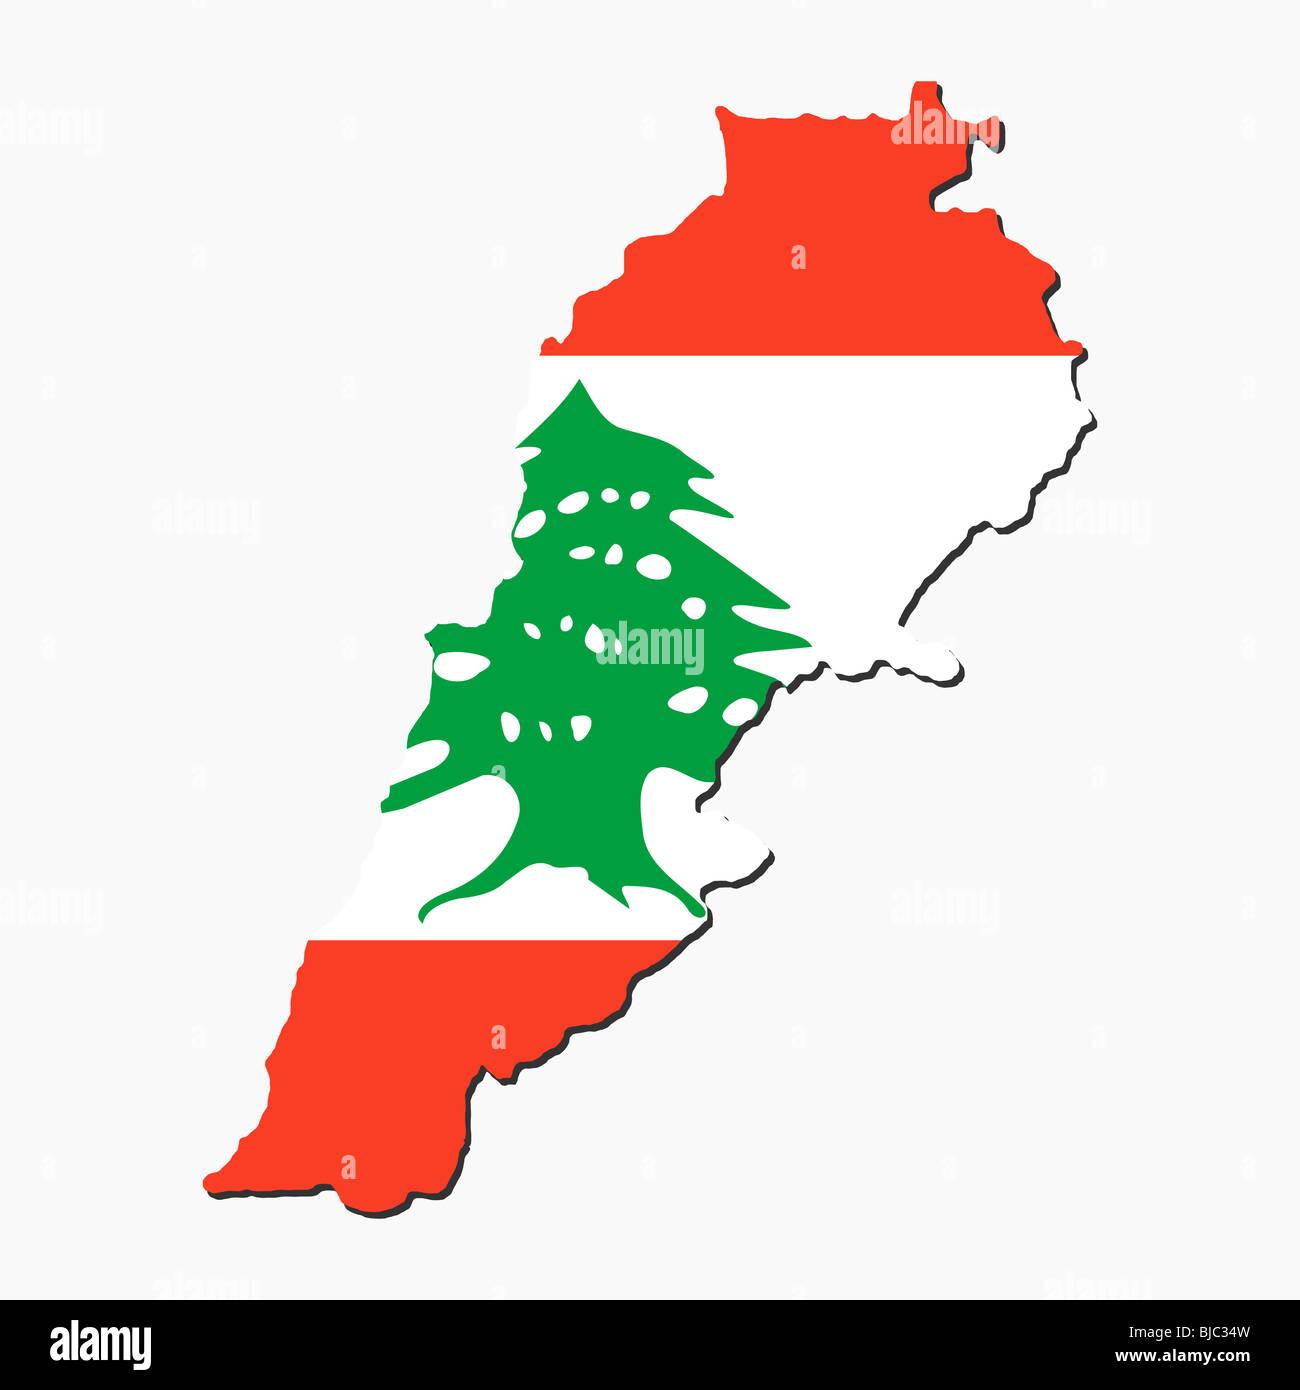 Map of lebanon and lebanese flag illustration stock photo royalty map of lebanon and lebanese flag illustration sciox Gallery